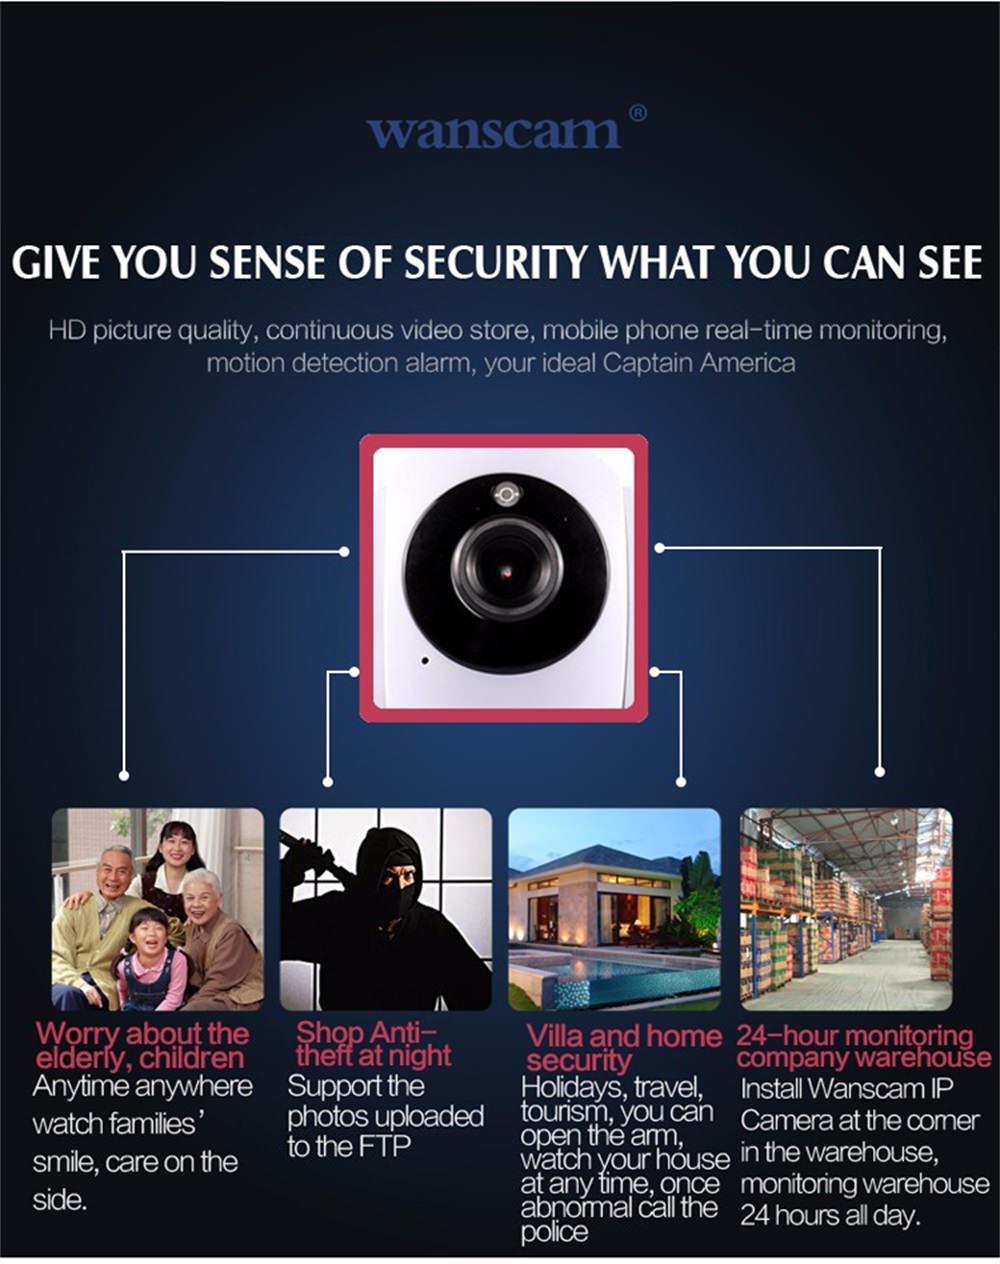 wanscam hw0036 ip camera price